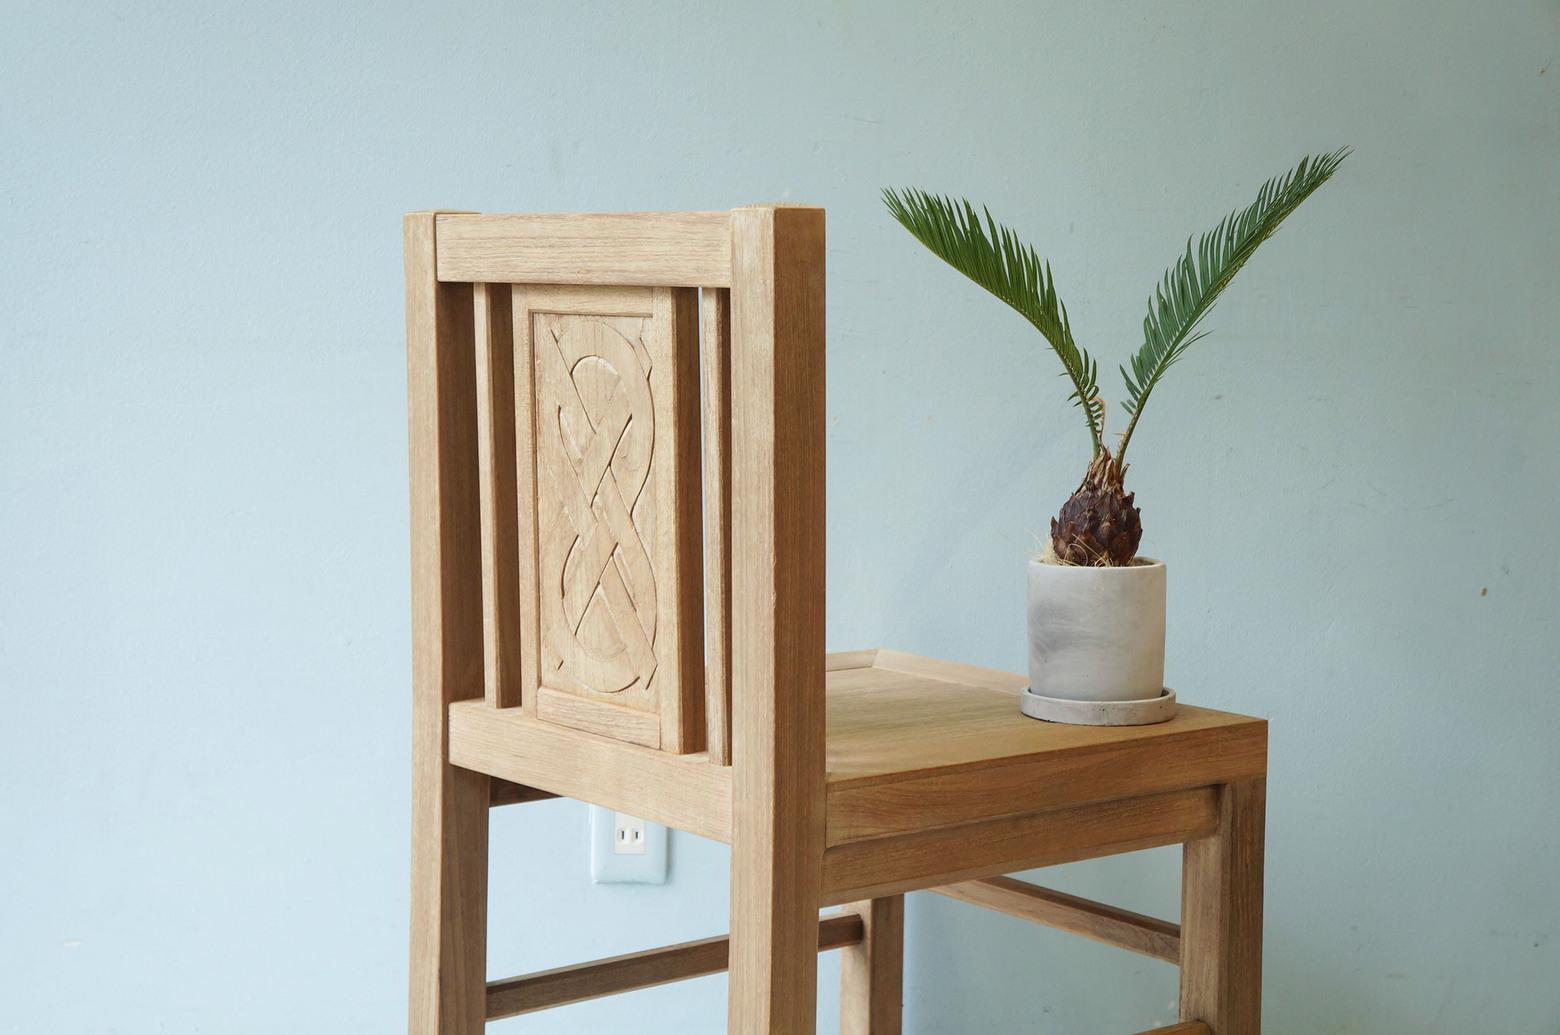 Arts&Crafts Style Antique Chair/アンティーク ダイニングチェア アーツ&クラフツ アール・デコ シンプルモダン 4